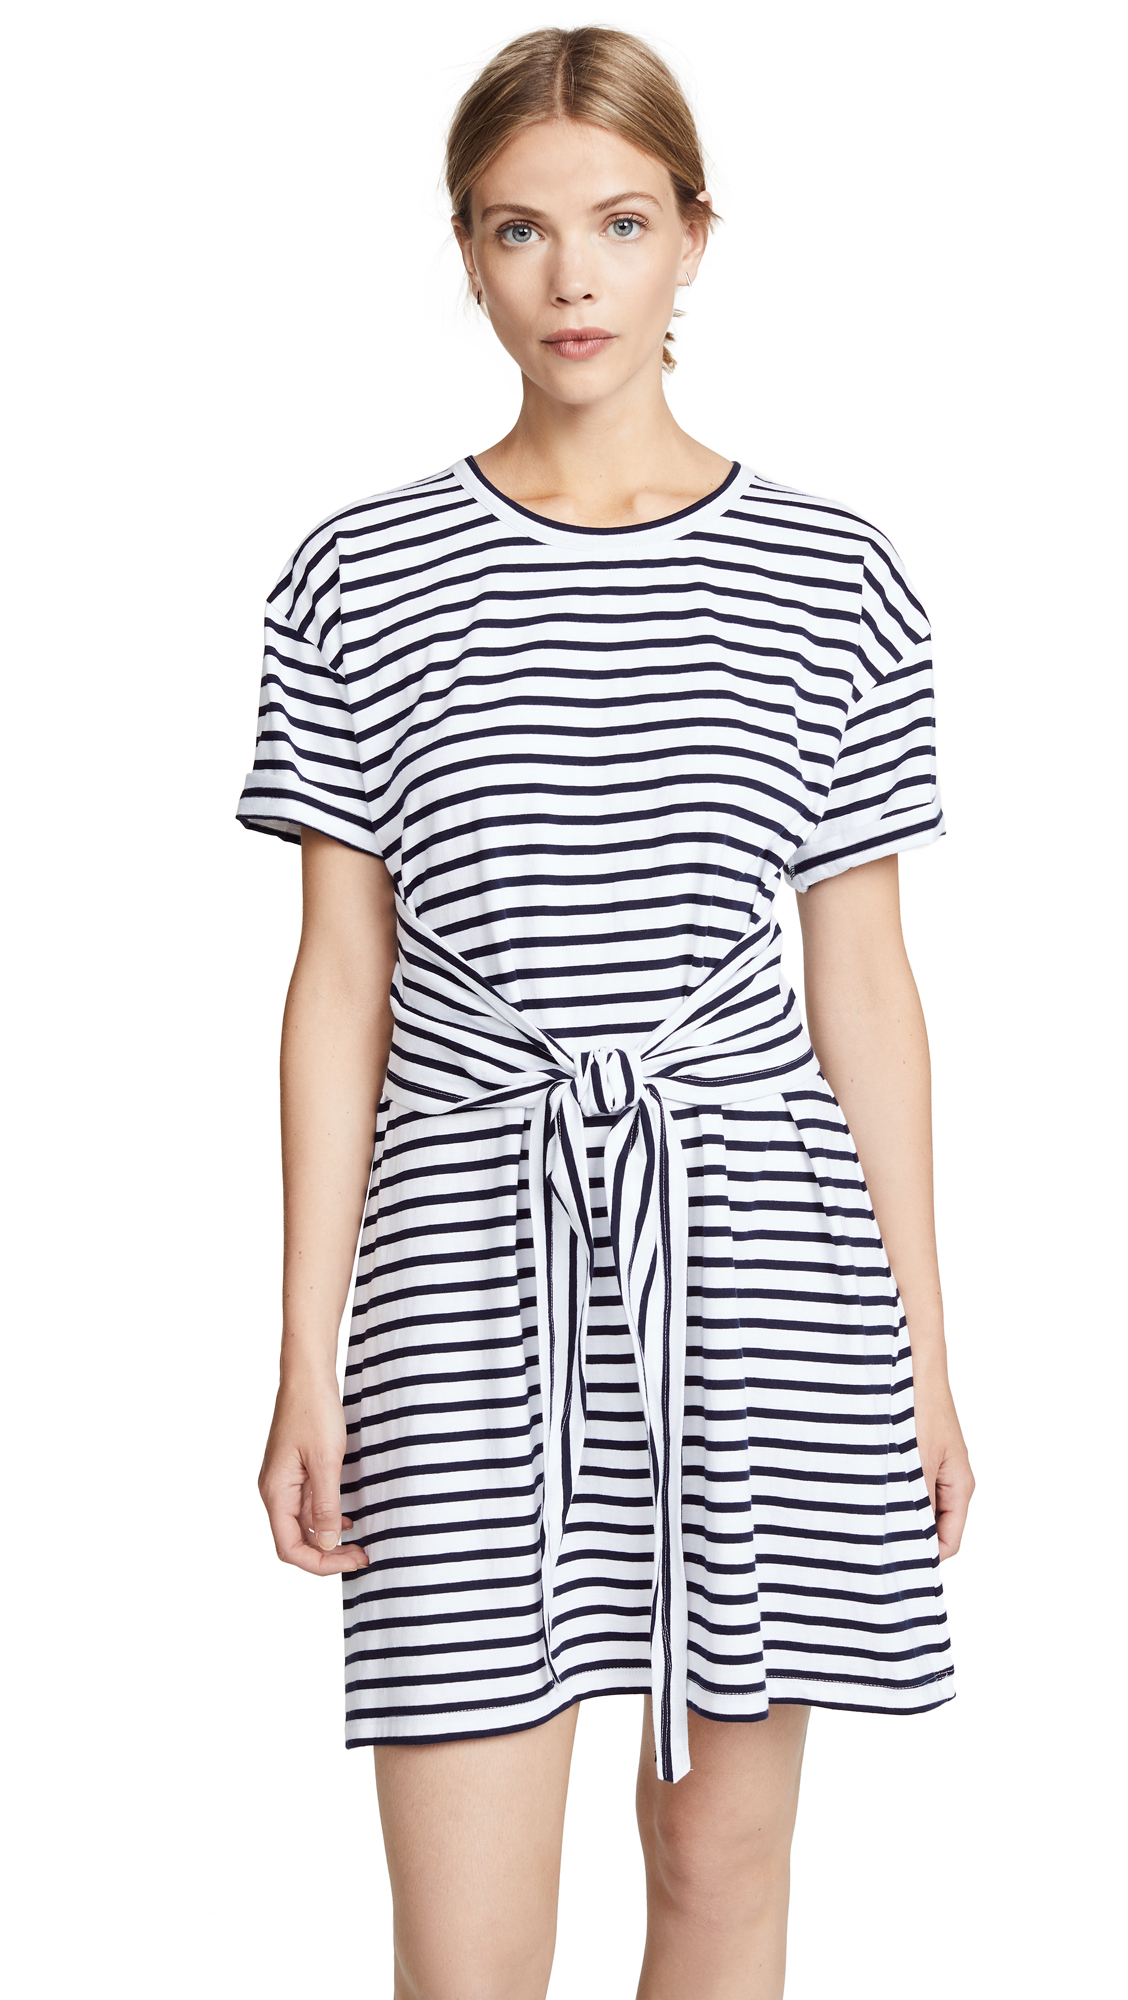 A.L.C. Raleigh Striped Dress